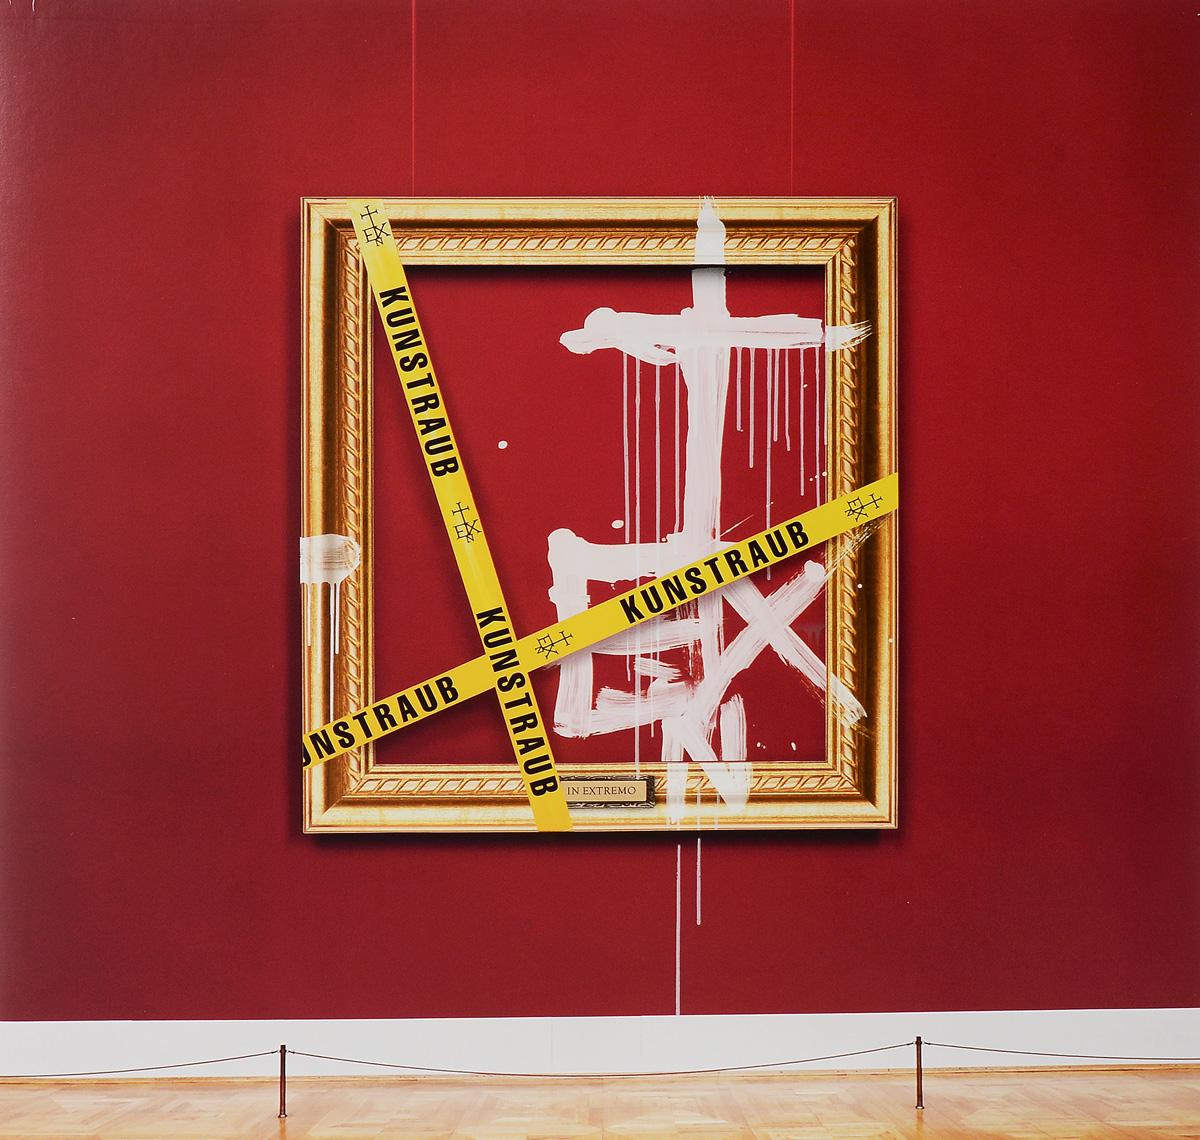 In Extremo In Extremo. Kunstraub (LP) in extremo in extremo vinyl collection 8 lp